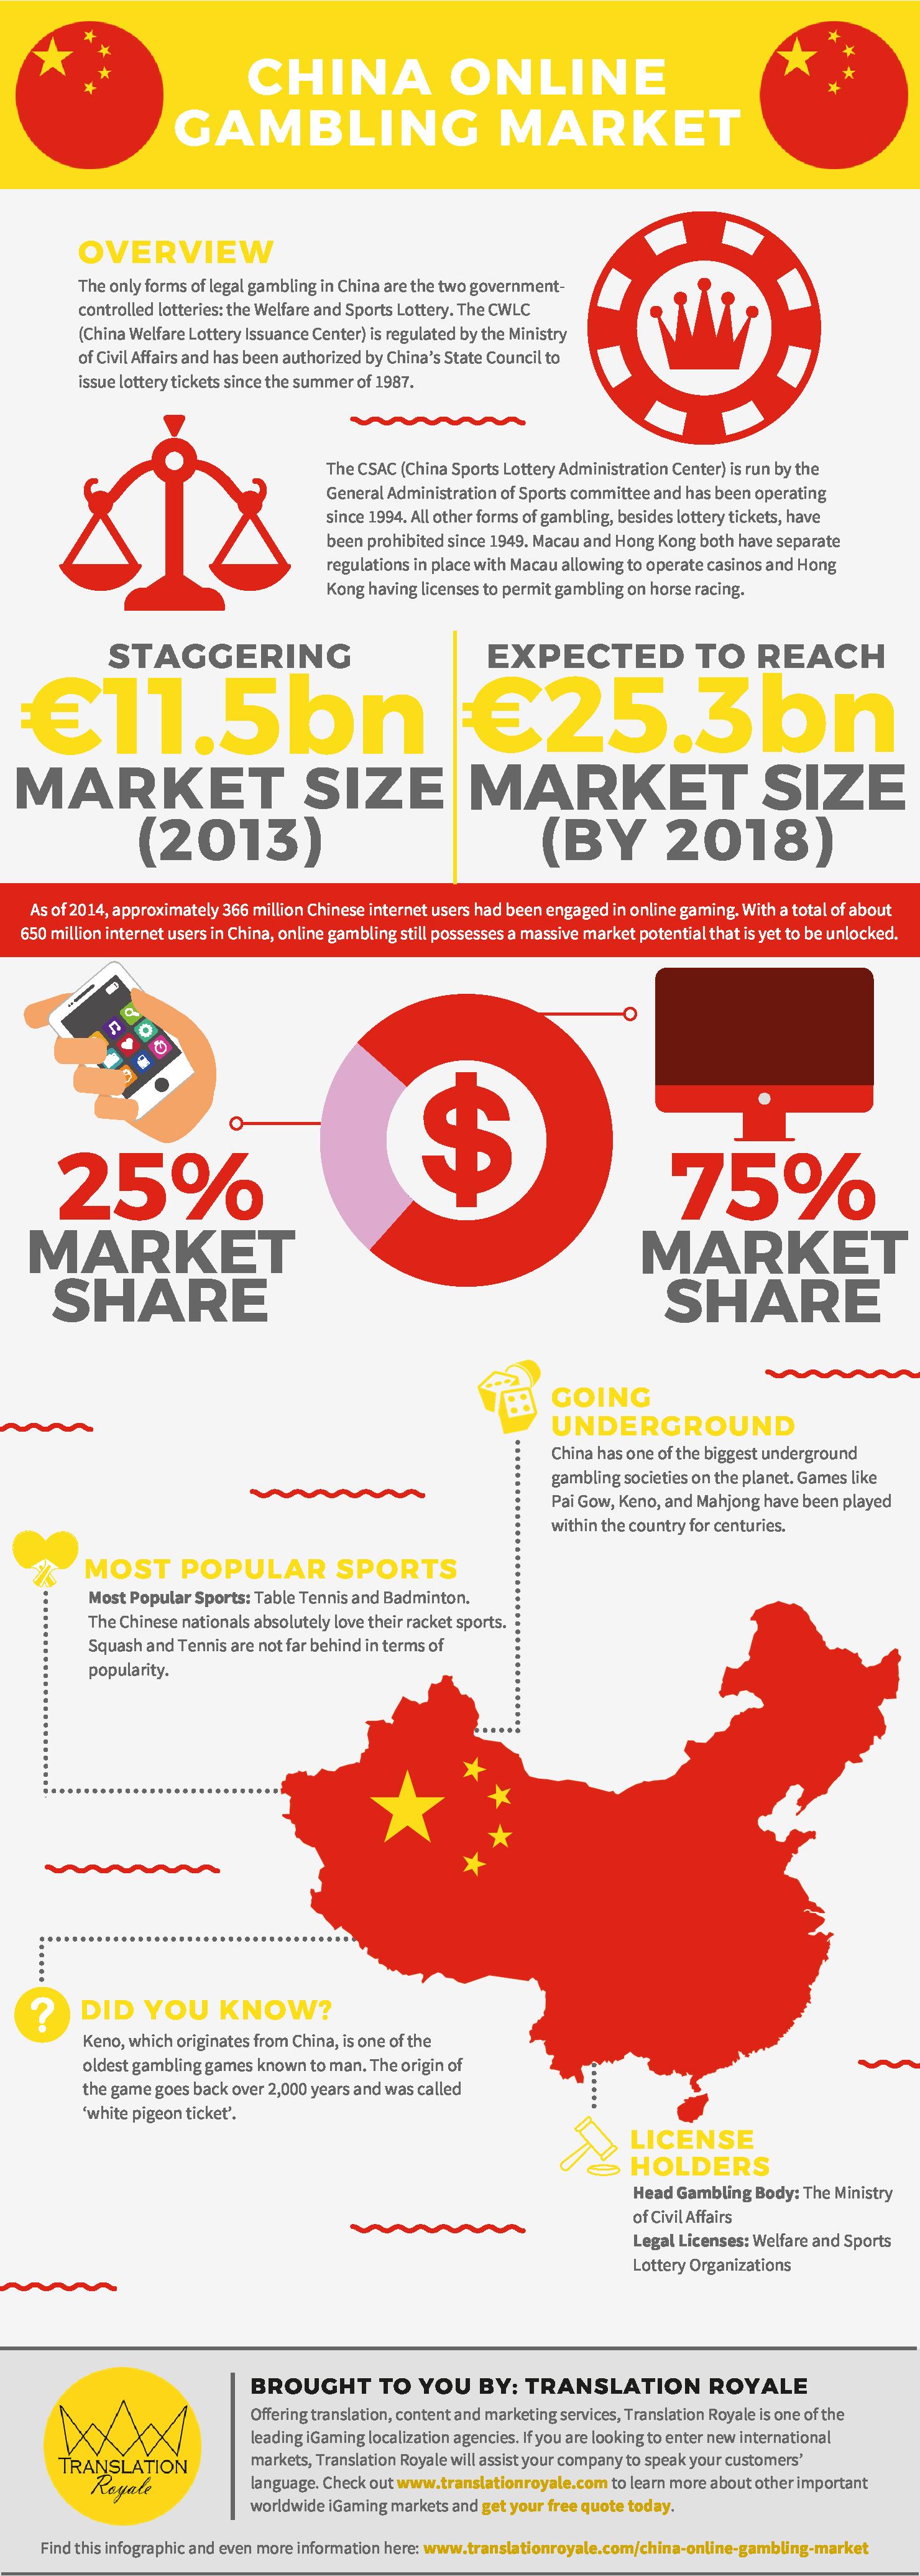 China Online Gambling Market Infographic